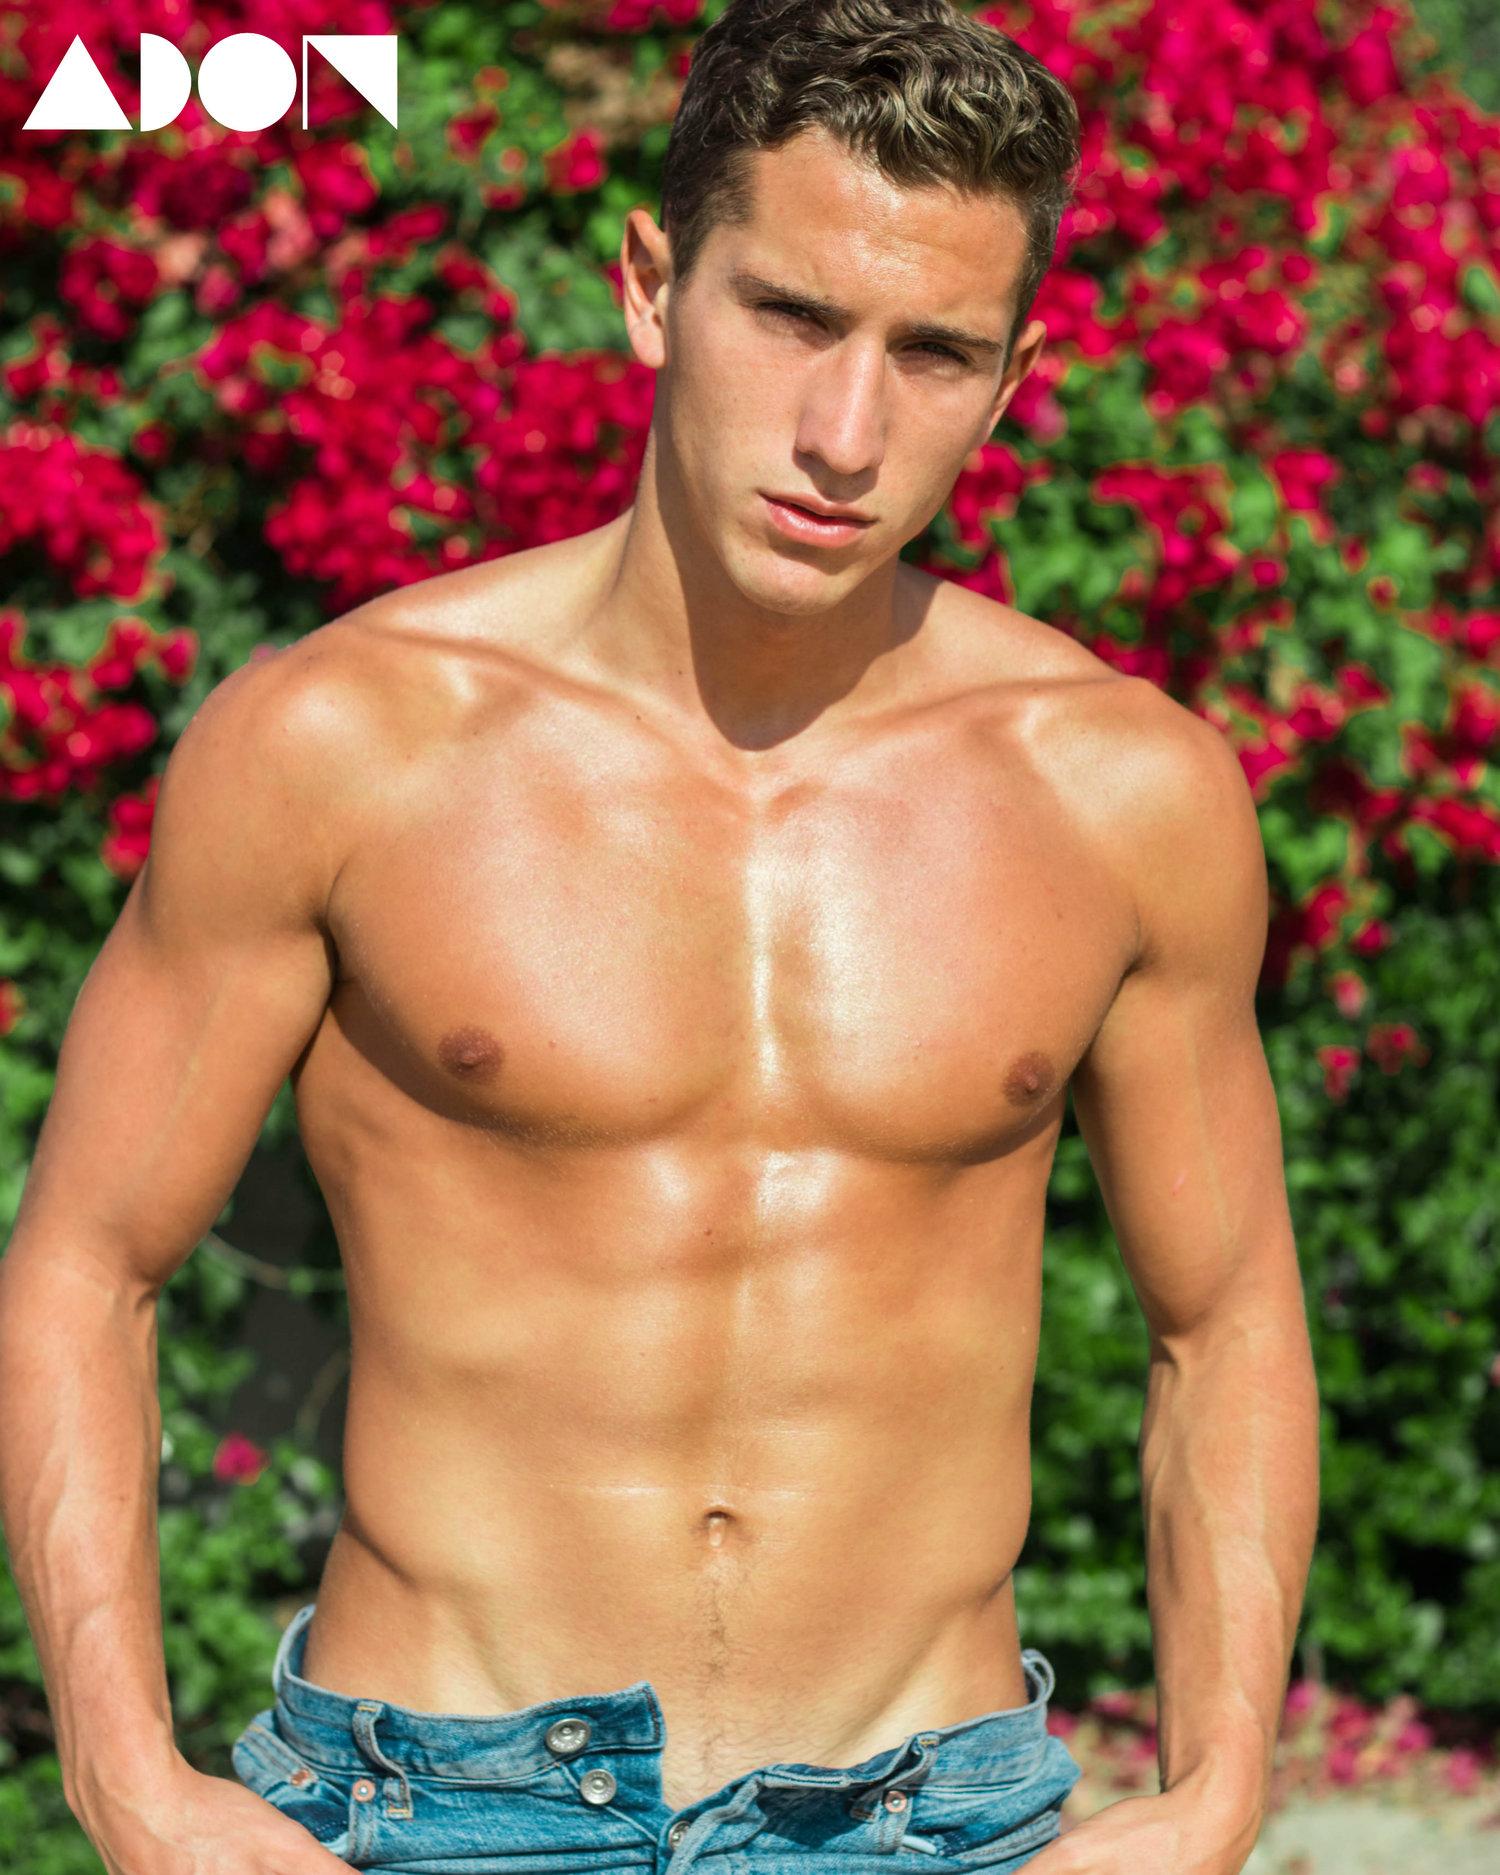 Adon Exclusive: Model Remi Lecoin By David Villalva